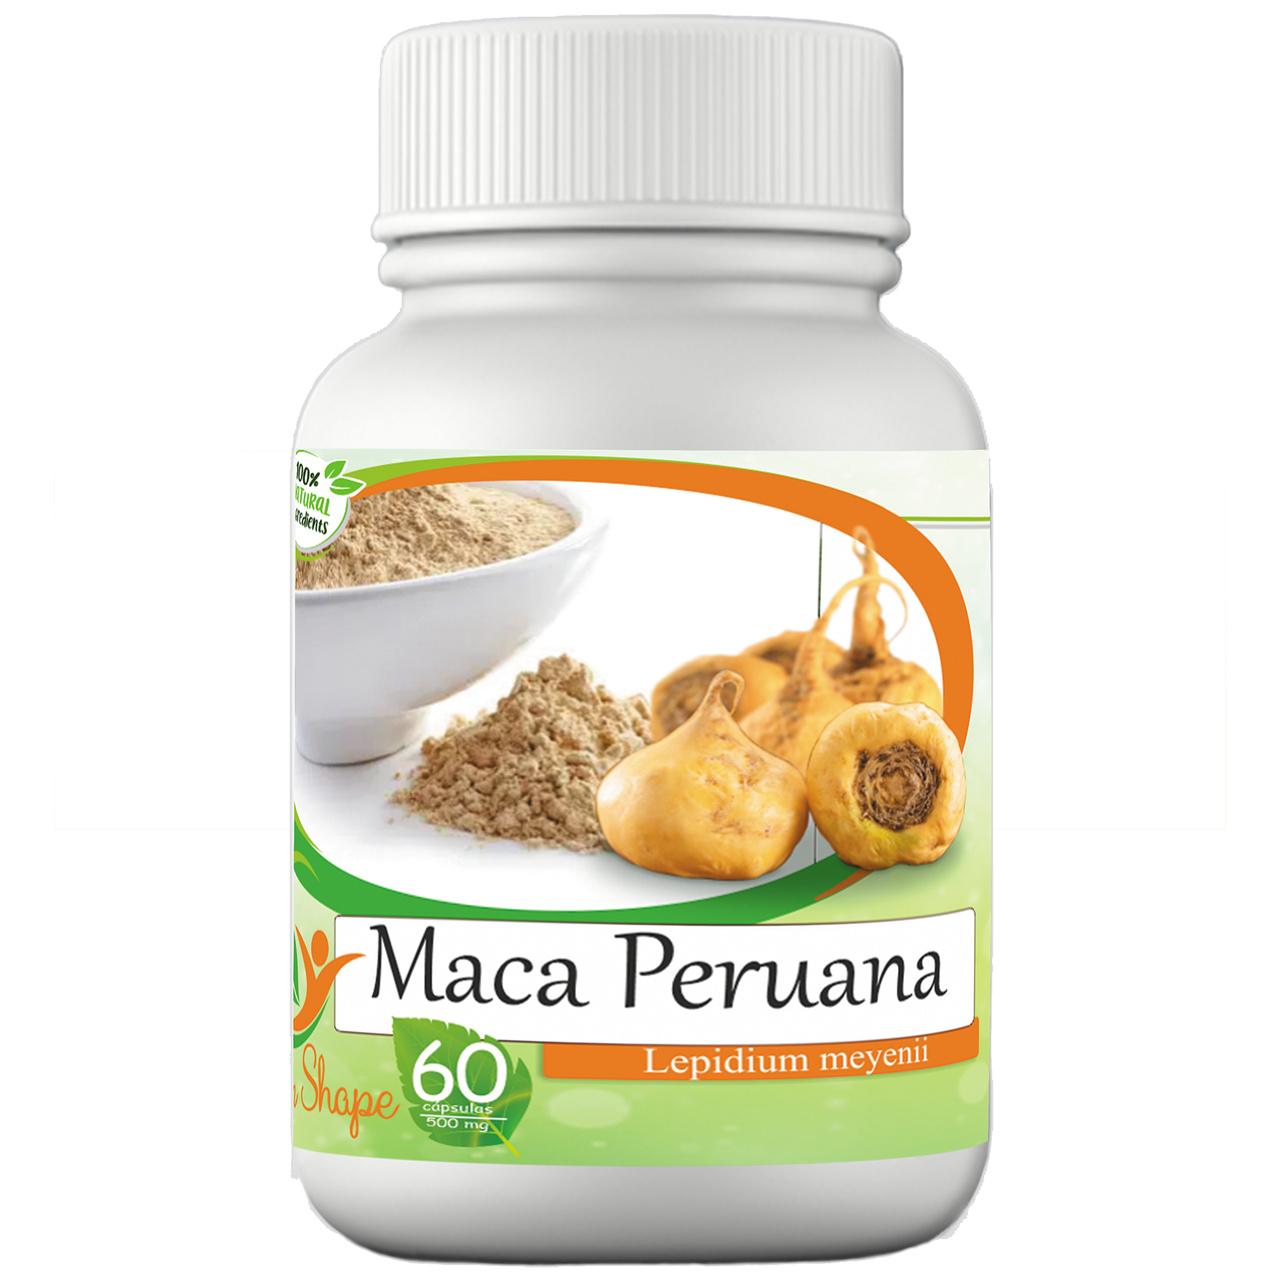 Maca Peruana 60 cápsulas - 100% Natural!